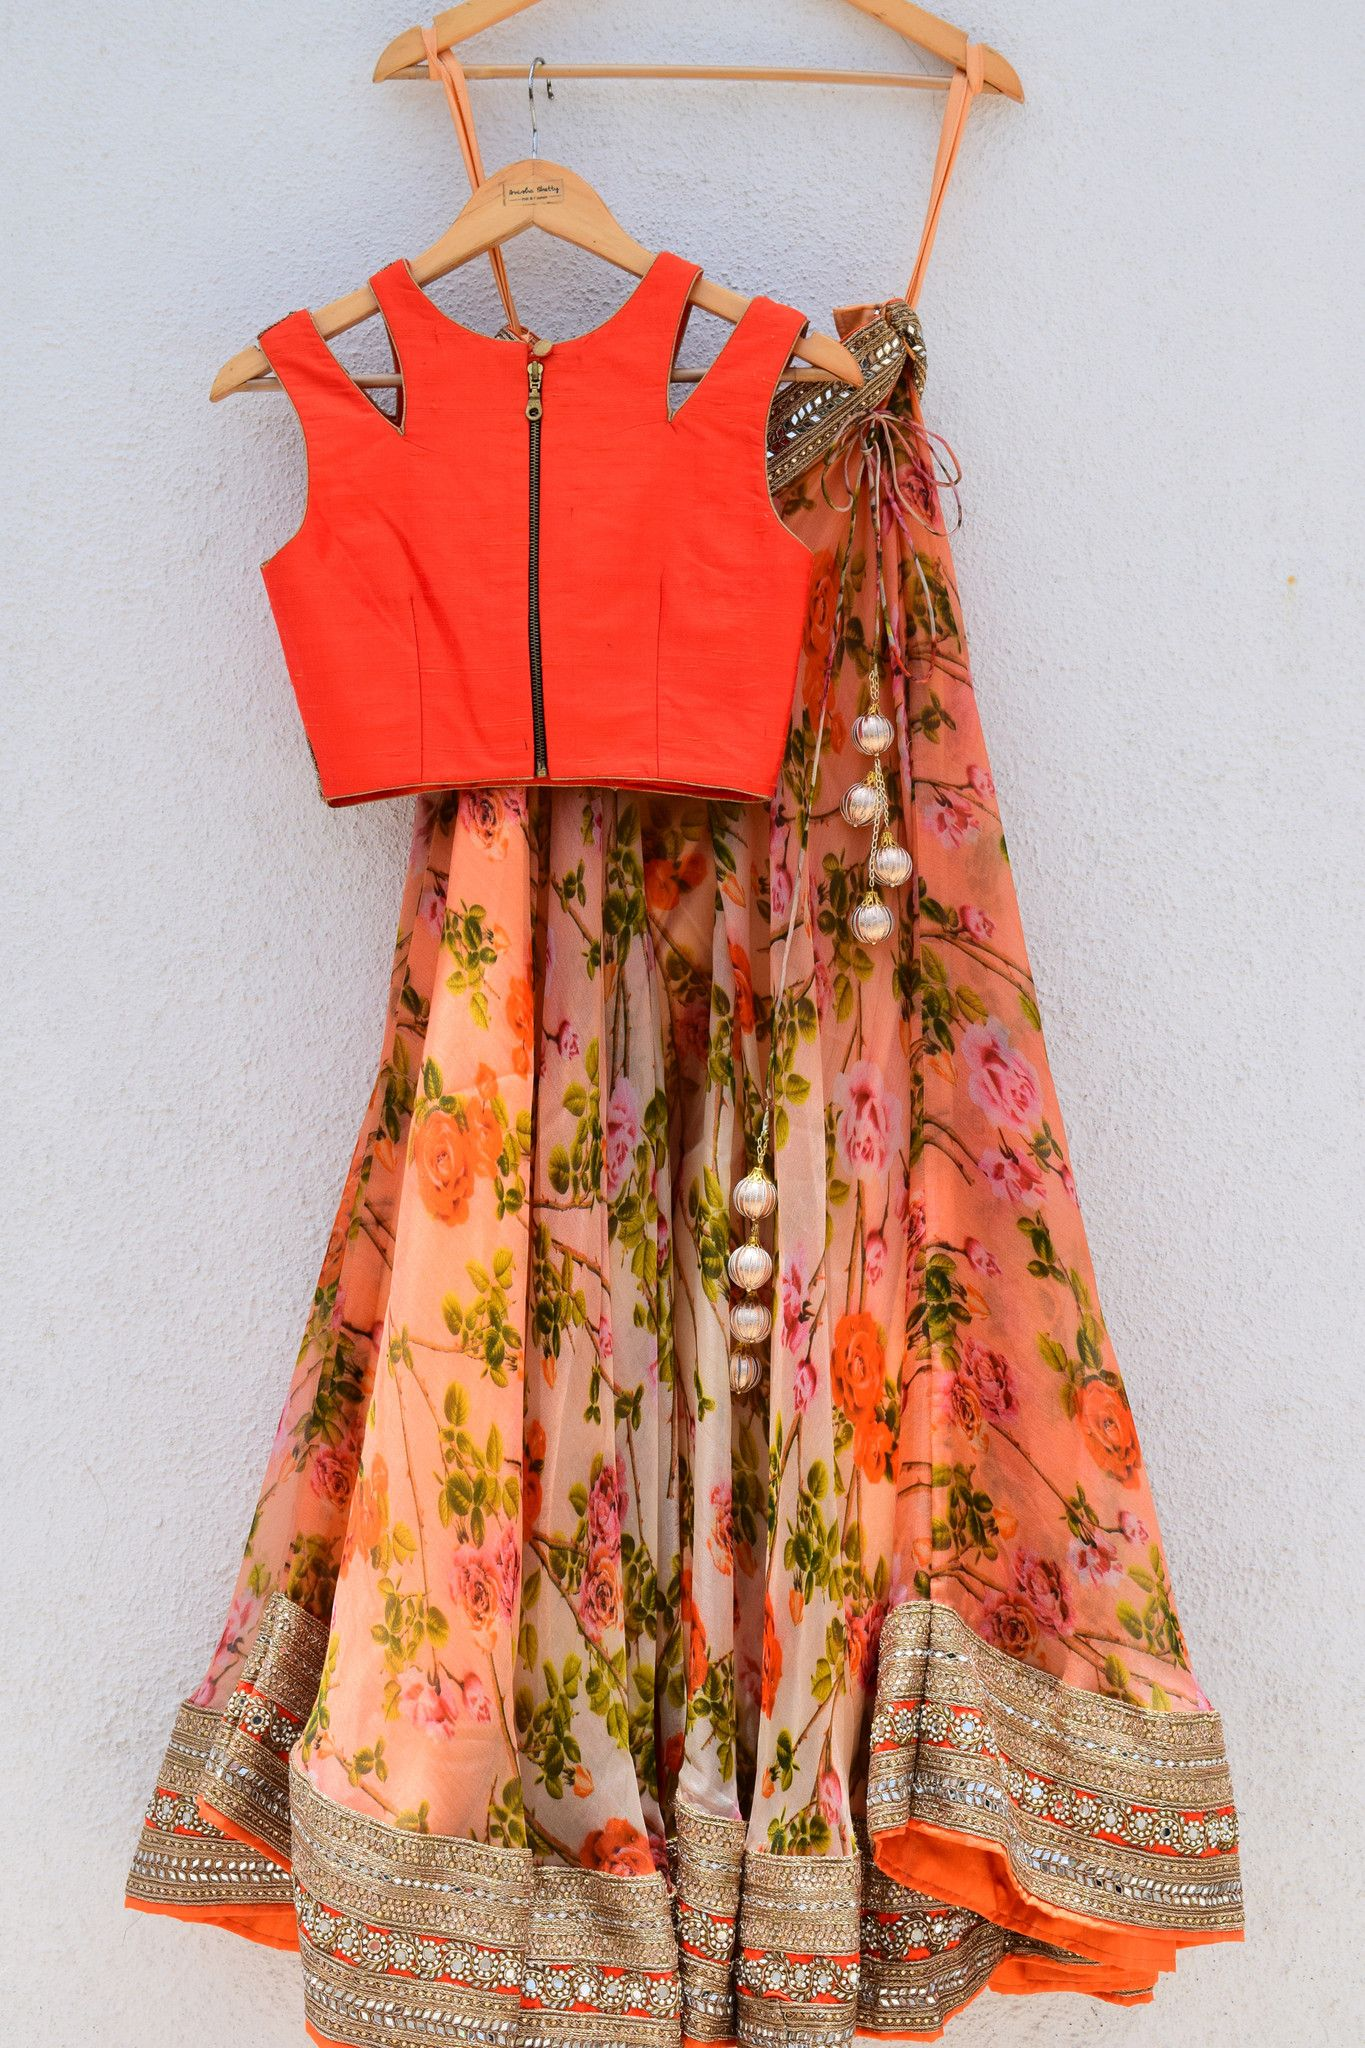 bcbcf88b42d546 Floral printed lehenga with orange cutwork blouse